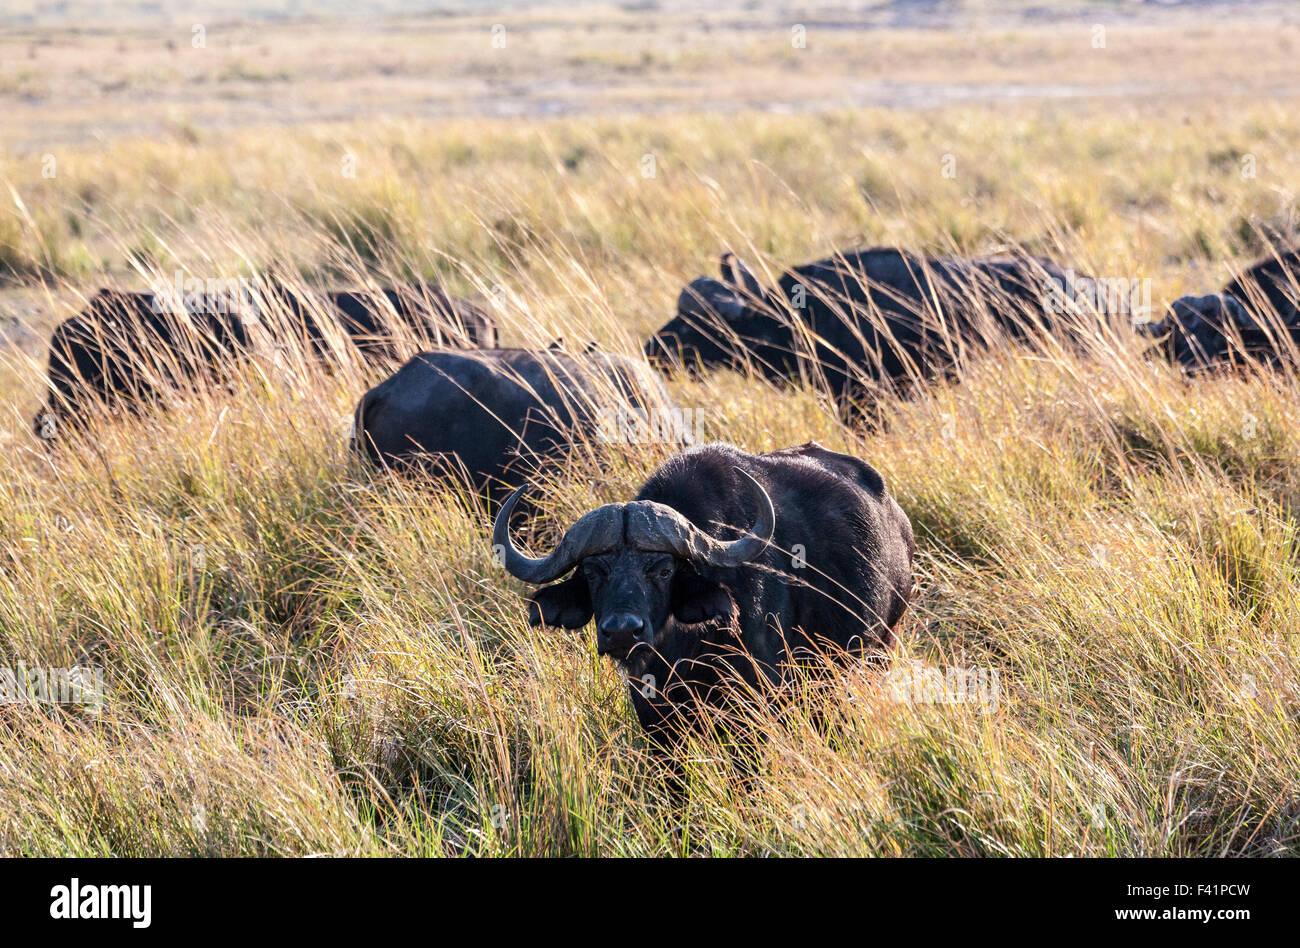 Buffalos - Stock Image